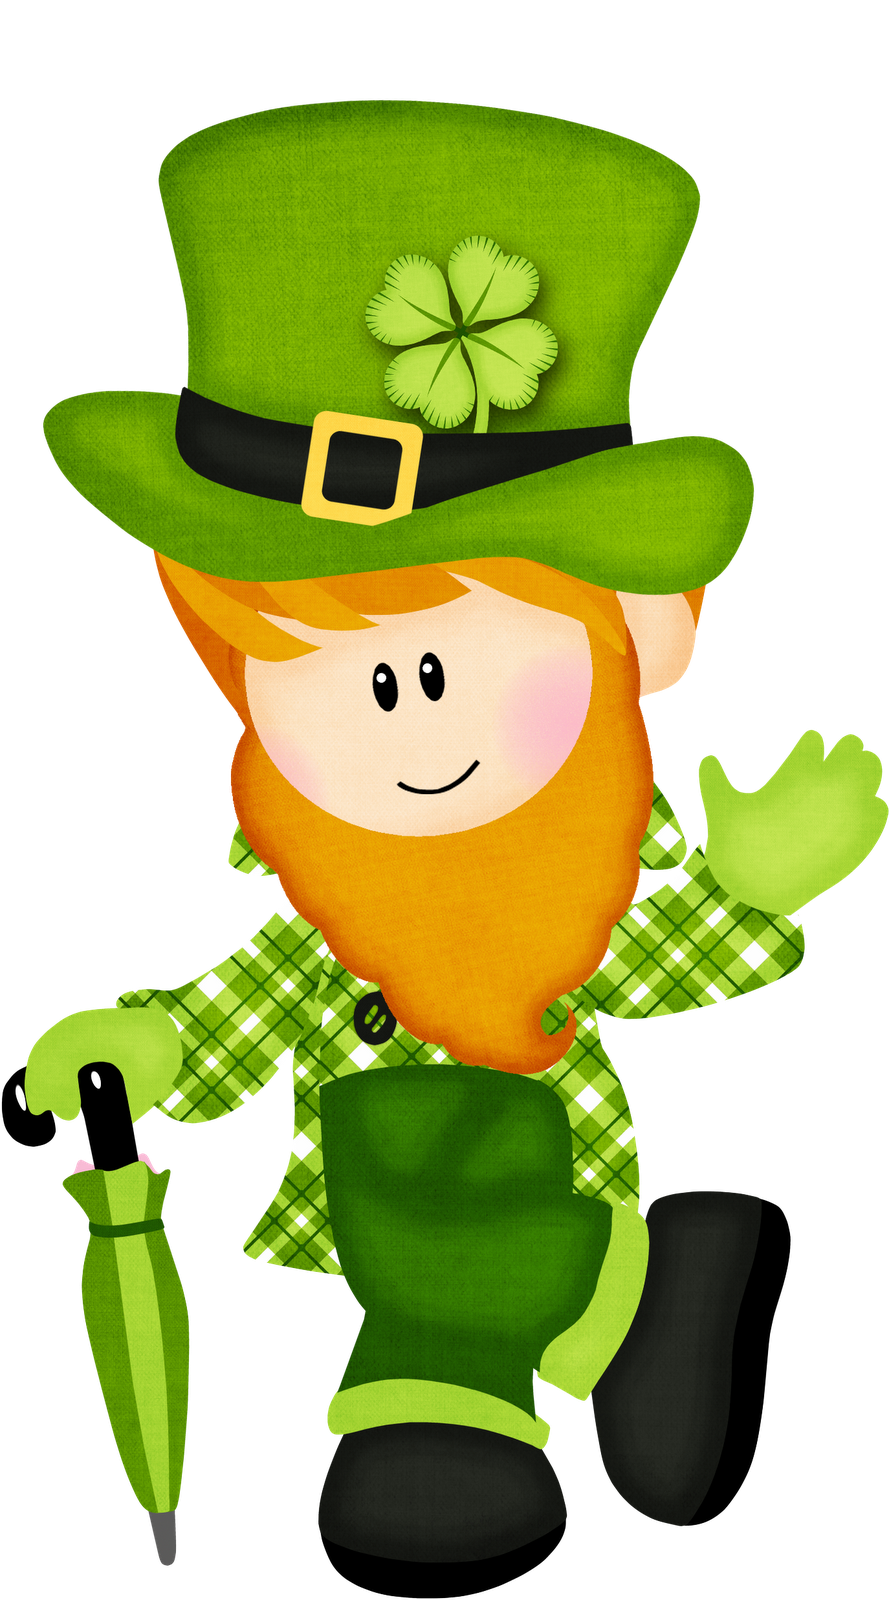 Luck of the irish. Leprechaun clipart lucky leprechaun